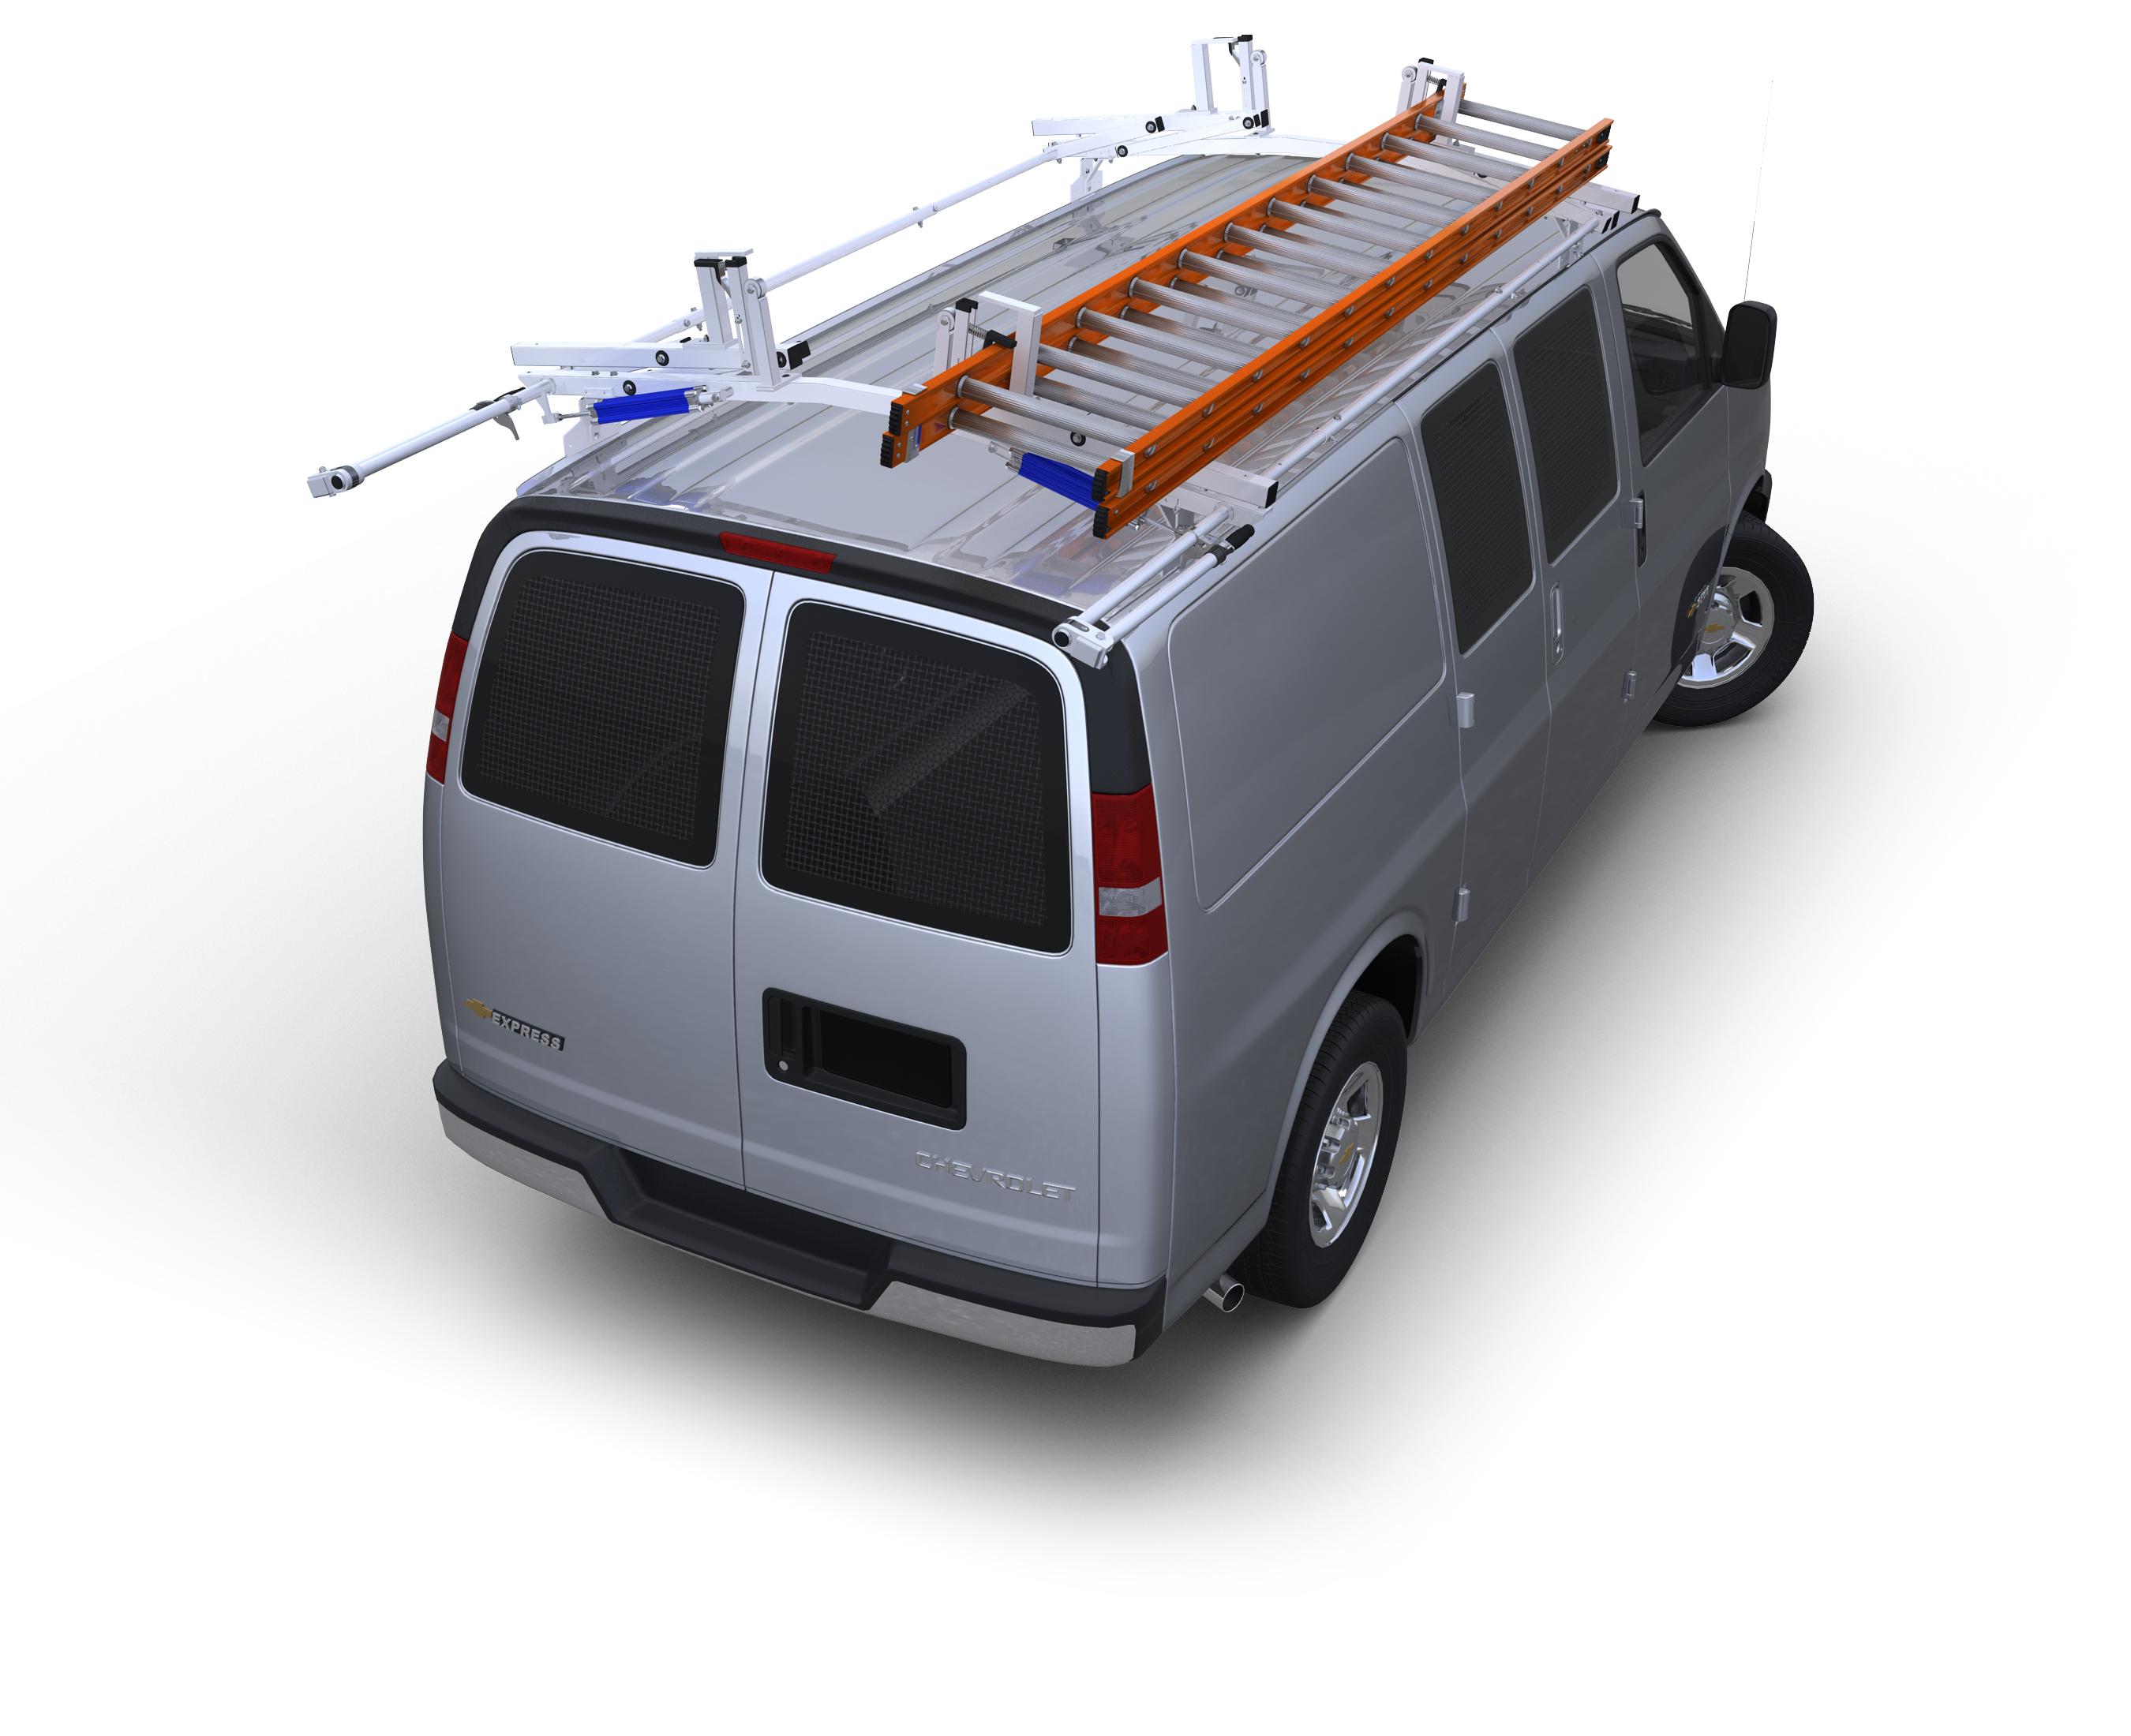 "MB Sprinter 144""WB High Roof Electrical Van Package, Steel Shelving - SAVE $175!"